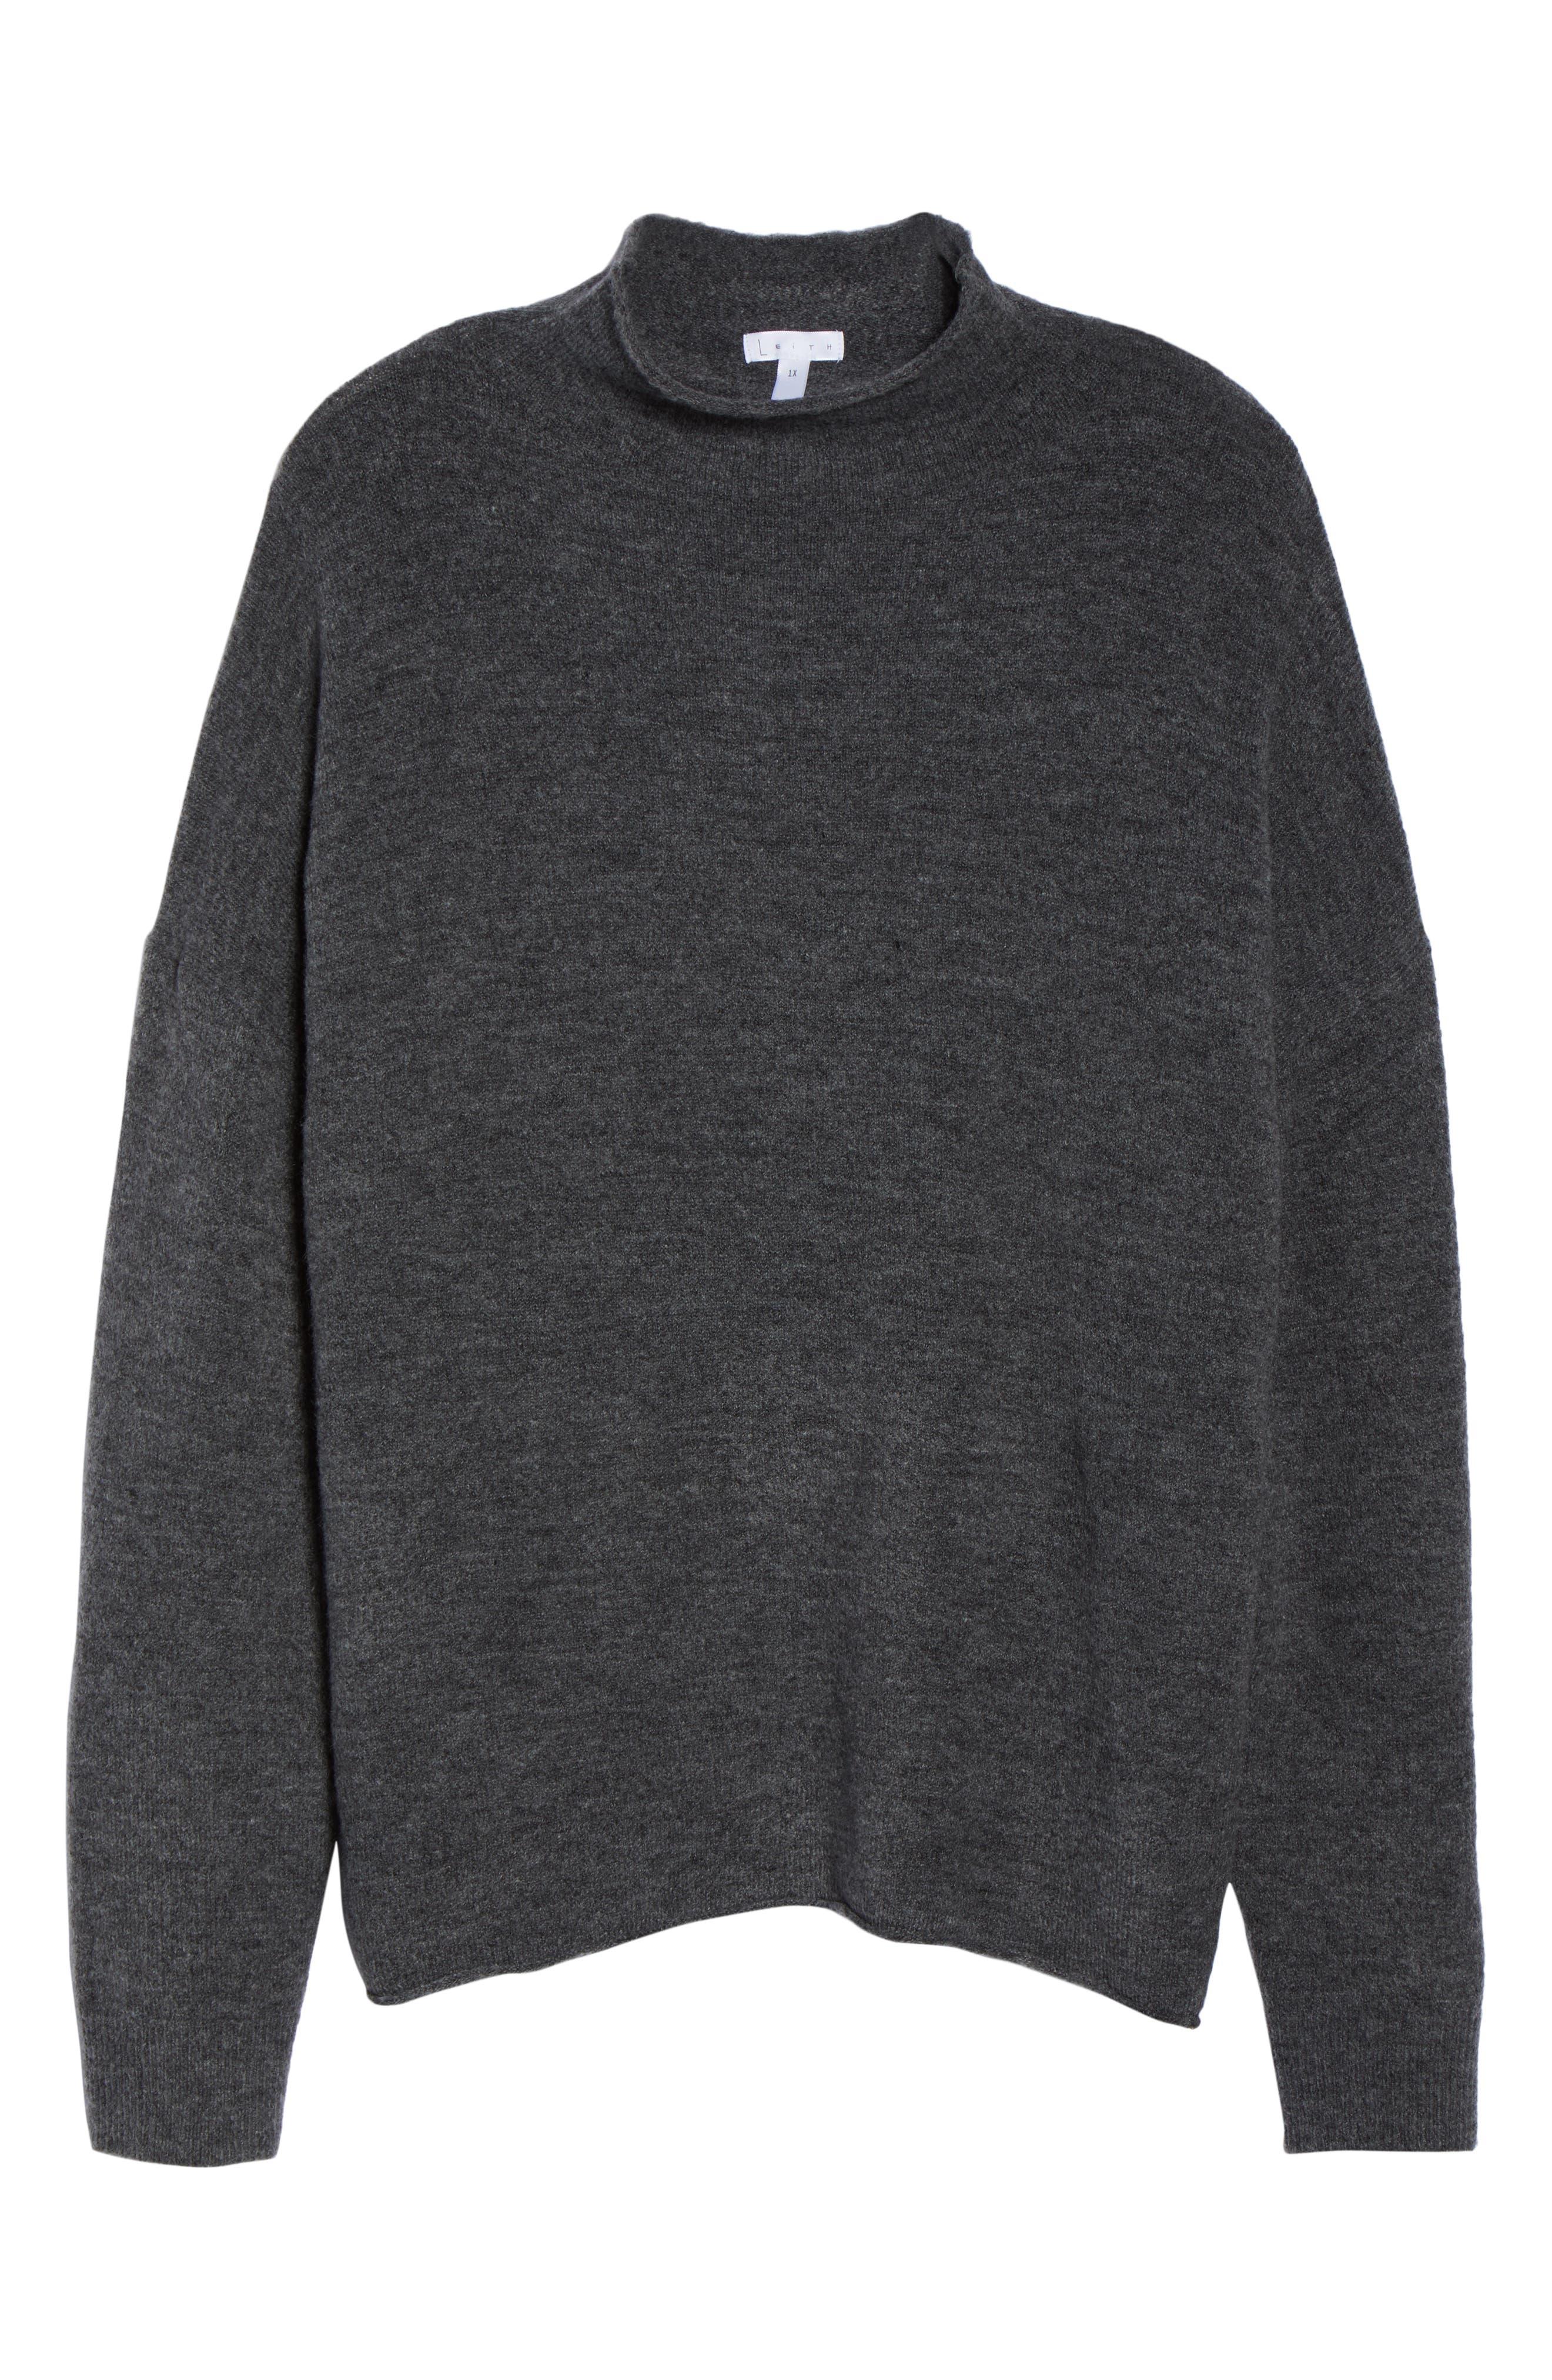 Cozy Mock Neck Sweater,                             Alternate thumbnail 10, color,                             GREY MEDIUM CHARCOAL HEATHER